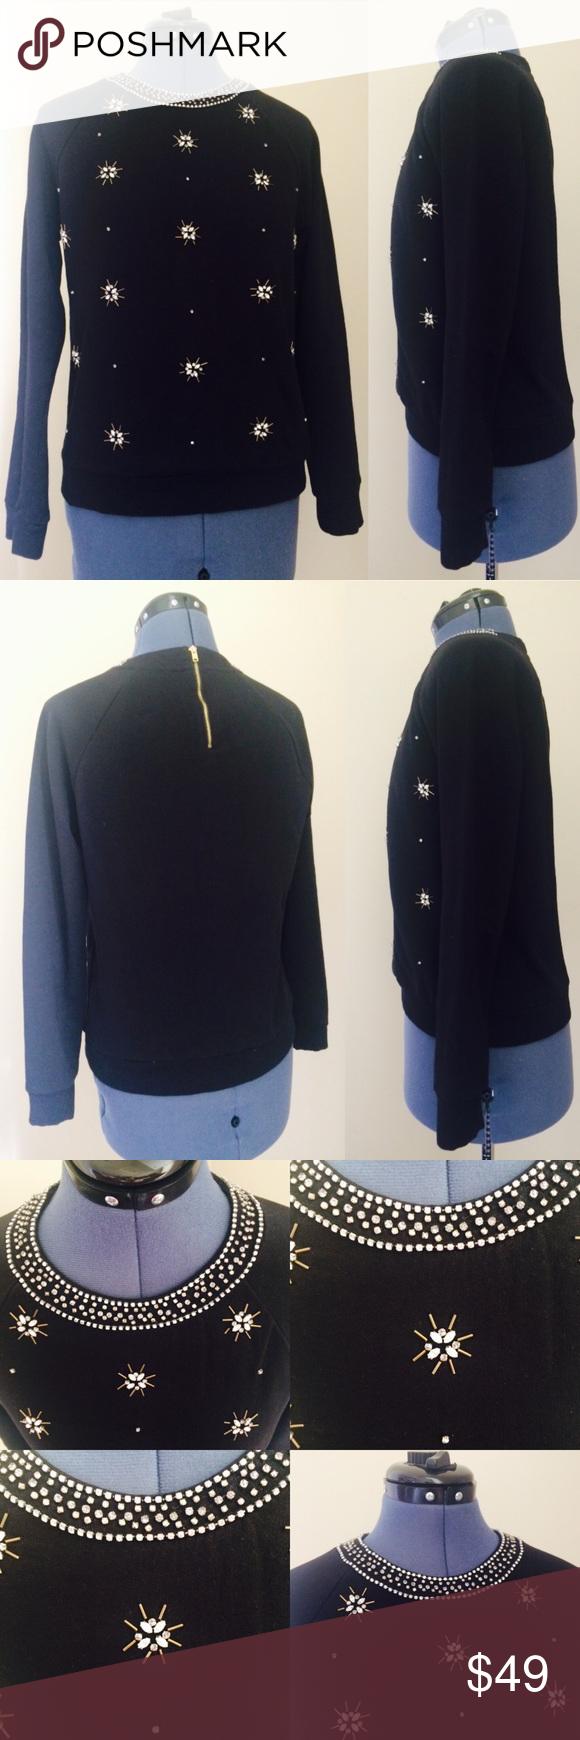 JUICY COUTURE Black Embellished Sweater JUICY COUTURE Black Embellished Sweater. Size S. No signs of worn. Juicy Couture Sweaters Crew & Scoop Necks